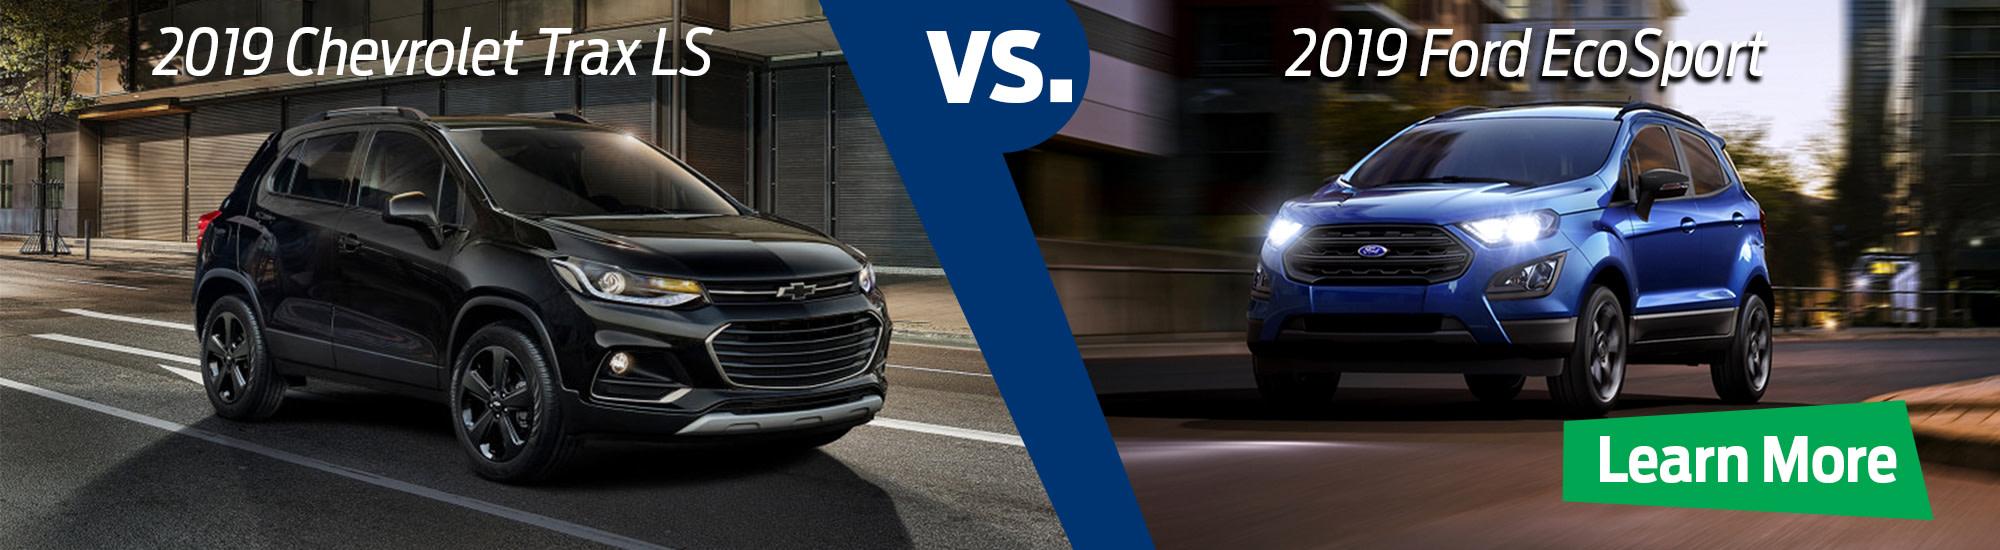 2019 Ford EcoSport S v 2019 Chevrolet Trax LS